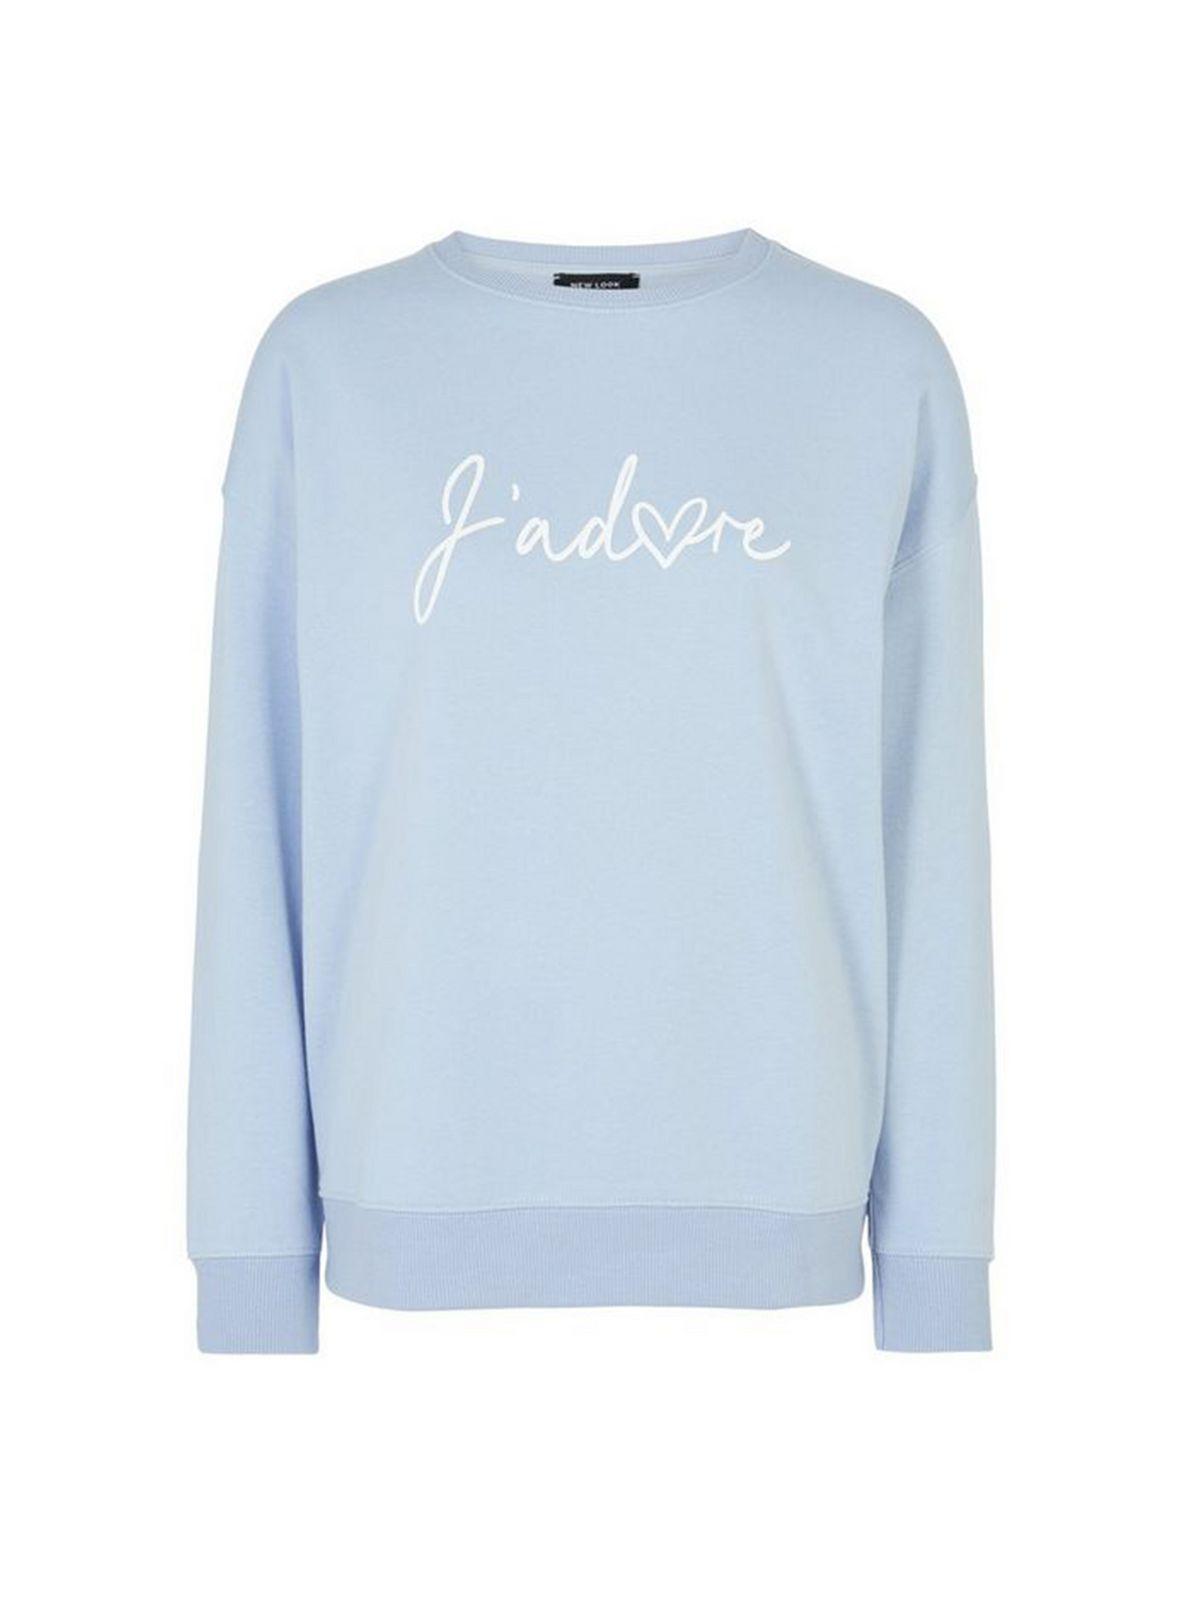 Blue J'Adore Slogan Sweatshirt